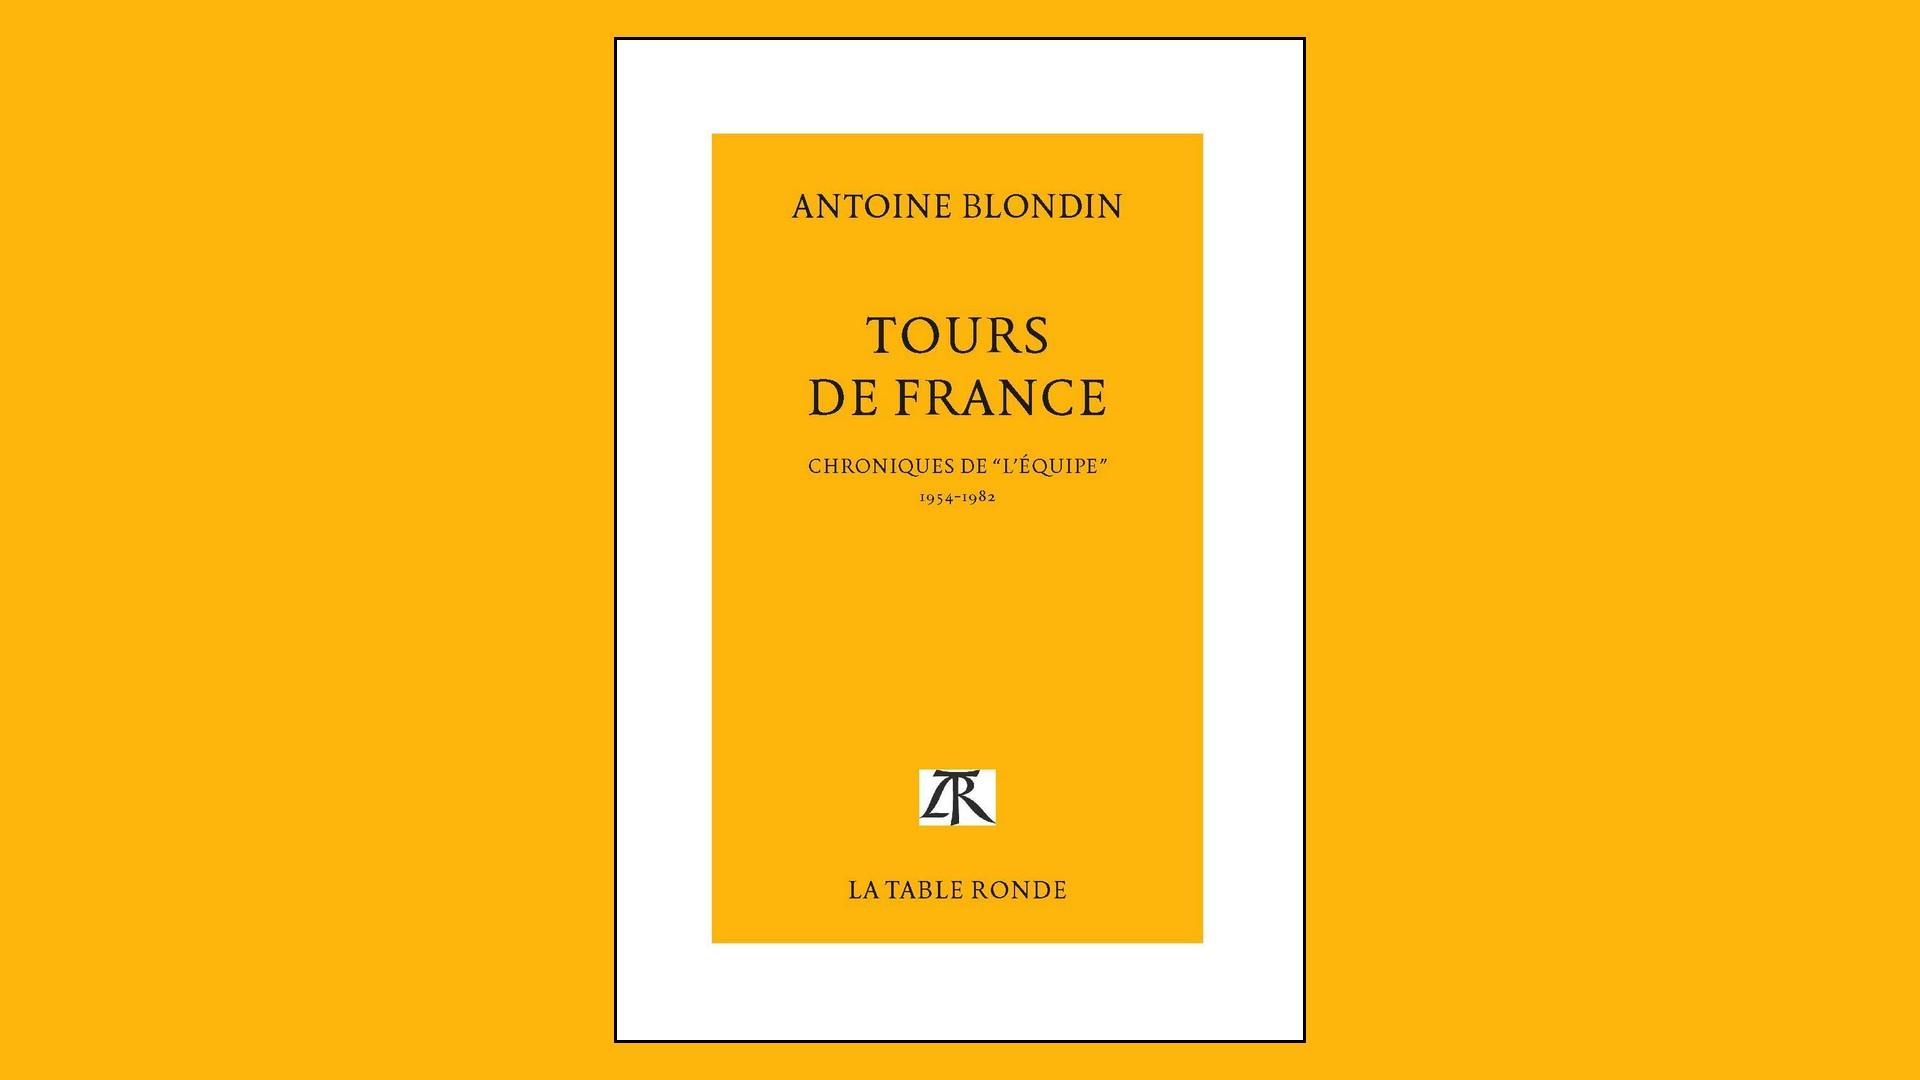 Livres – Tours de France – Antoine Blondin (2001)